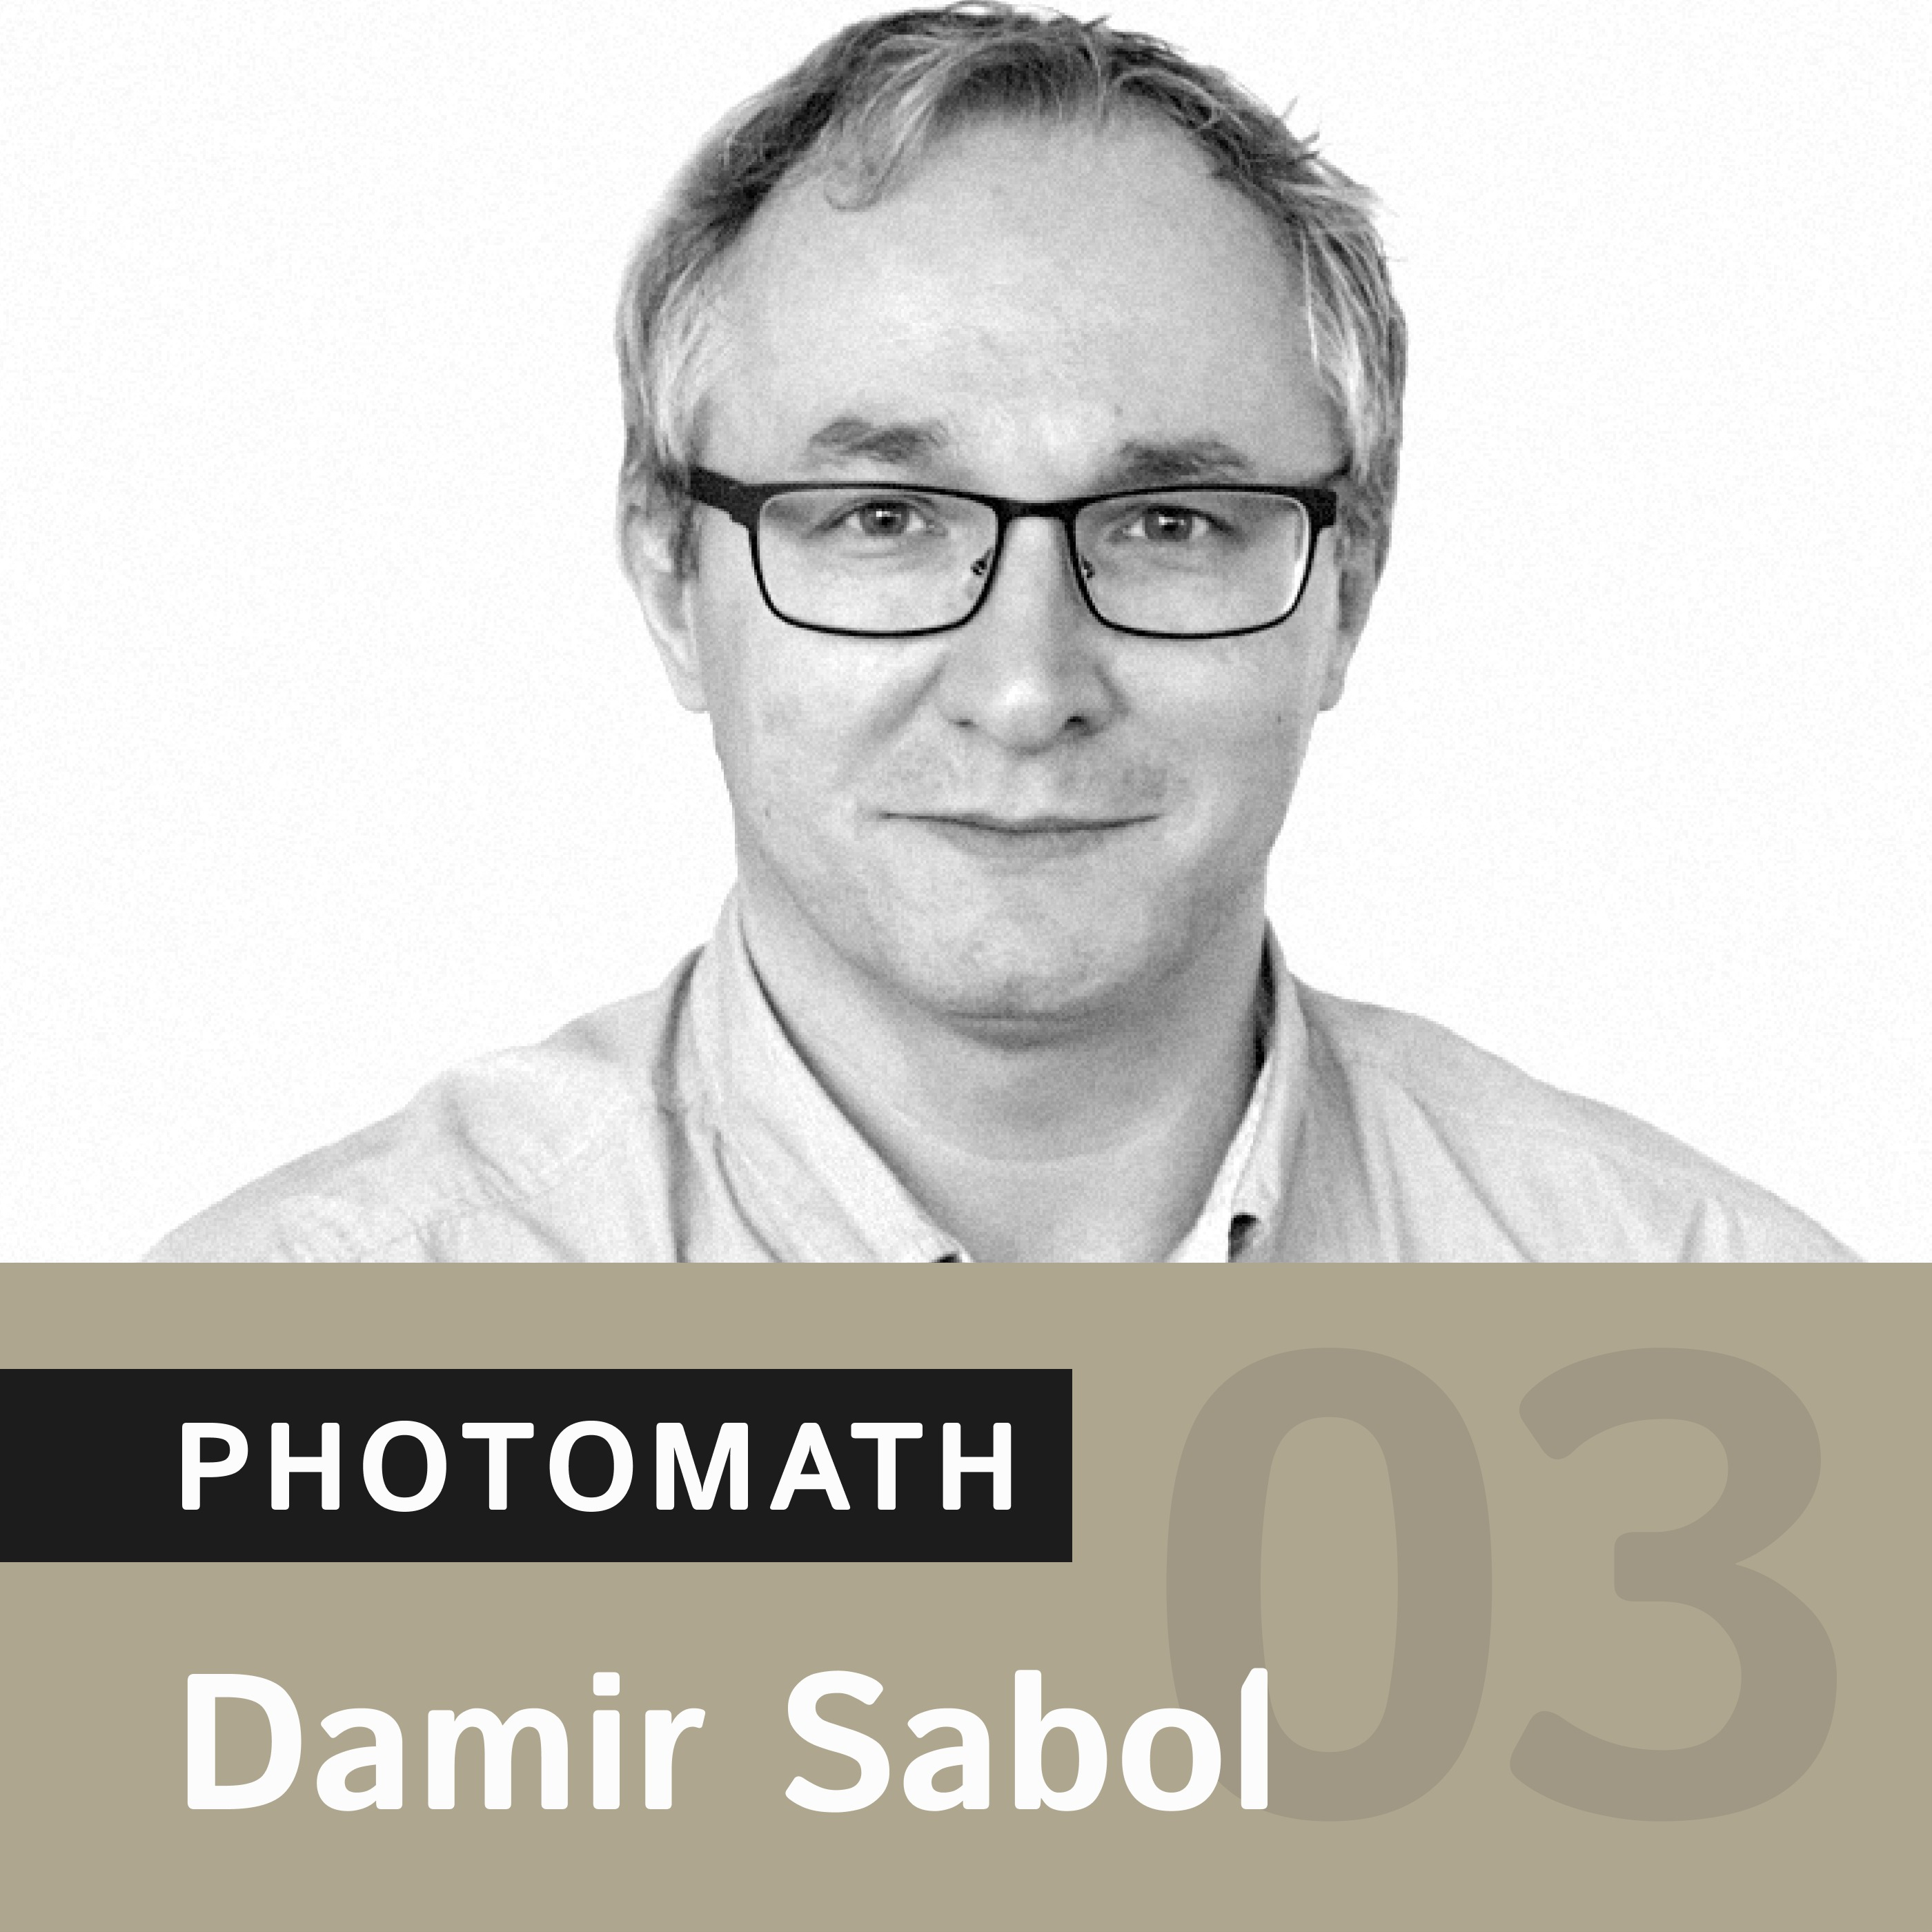 Photomath - Damir Sabol